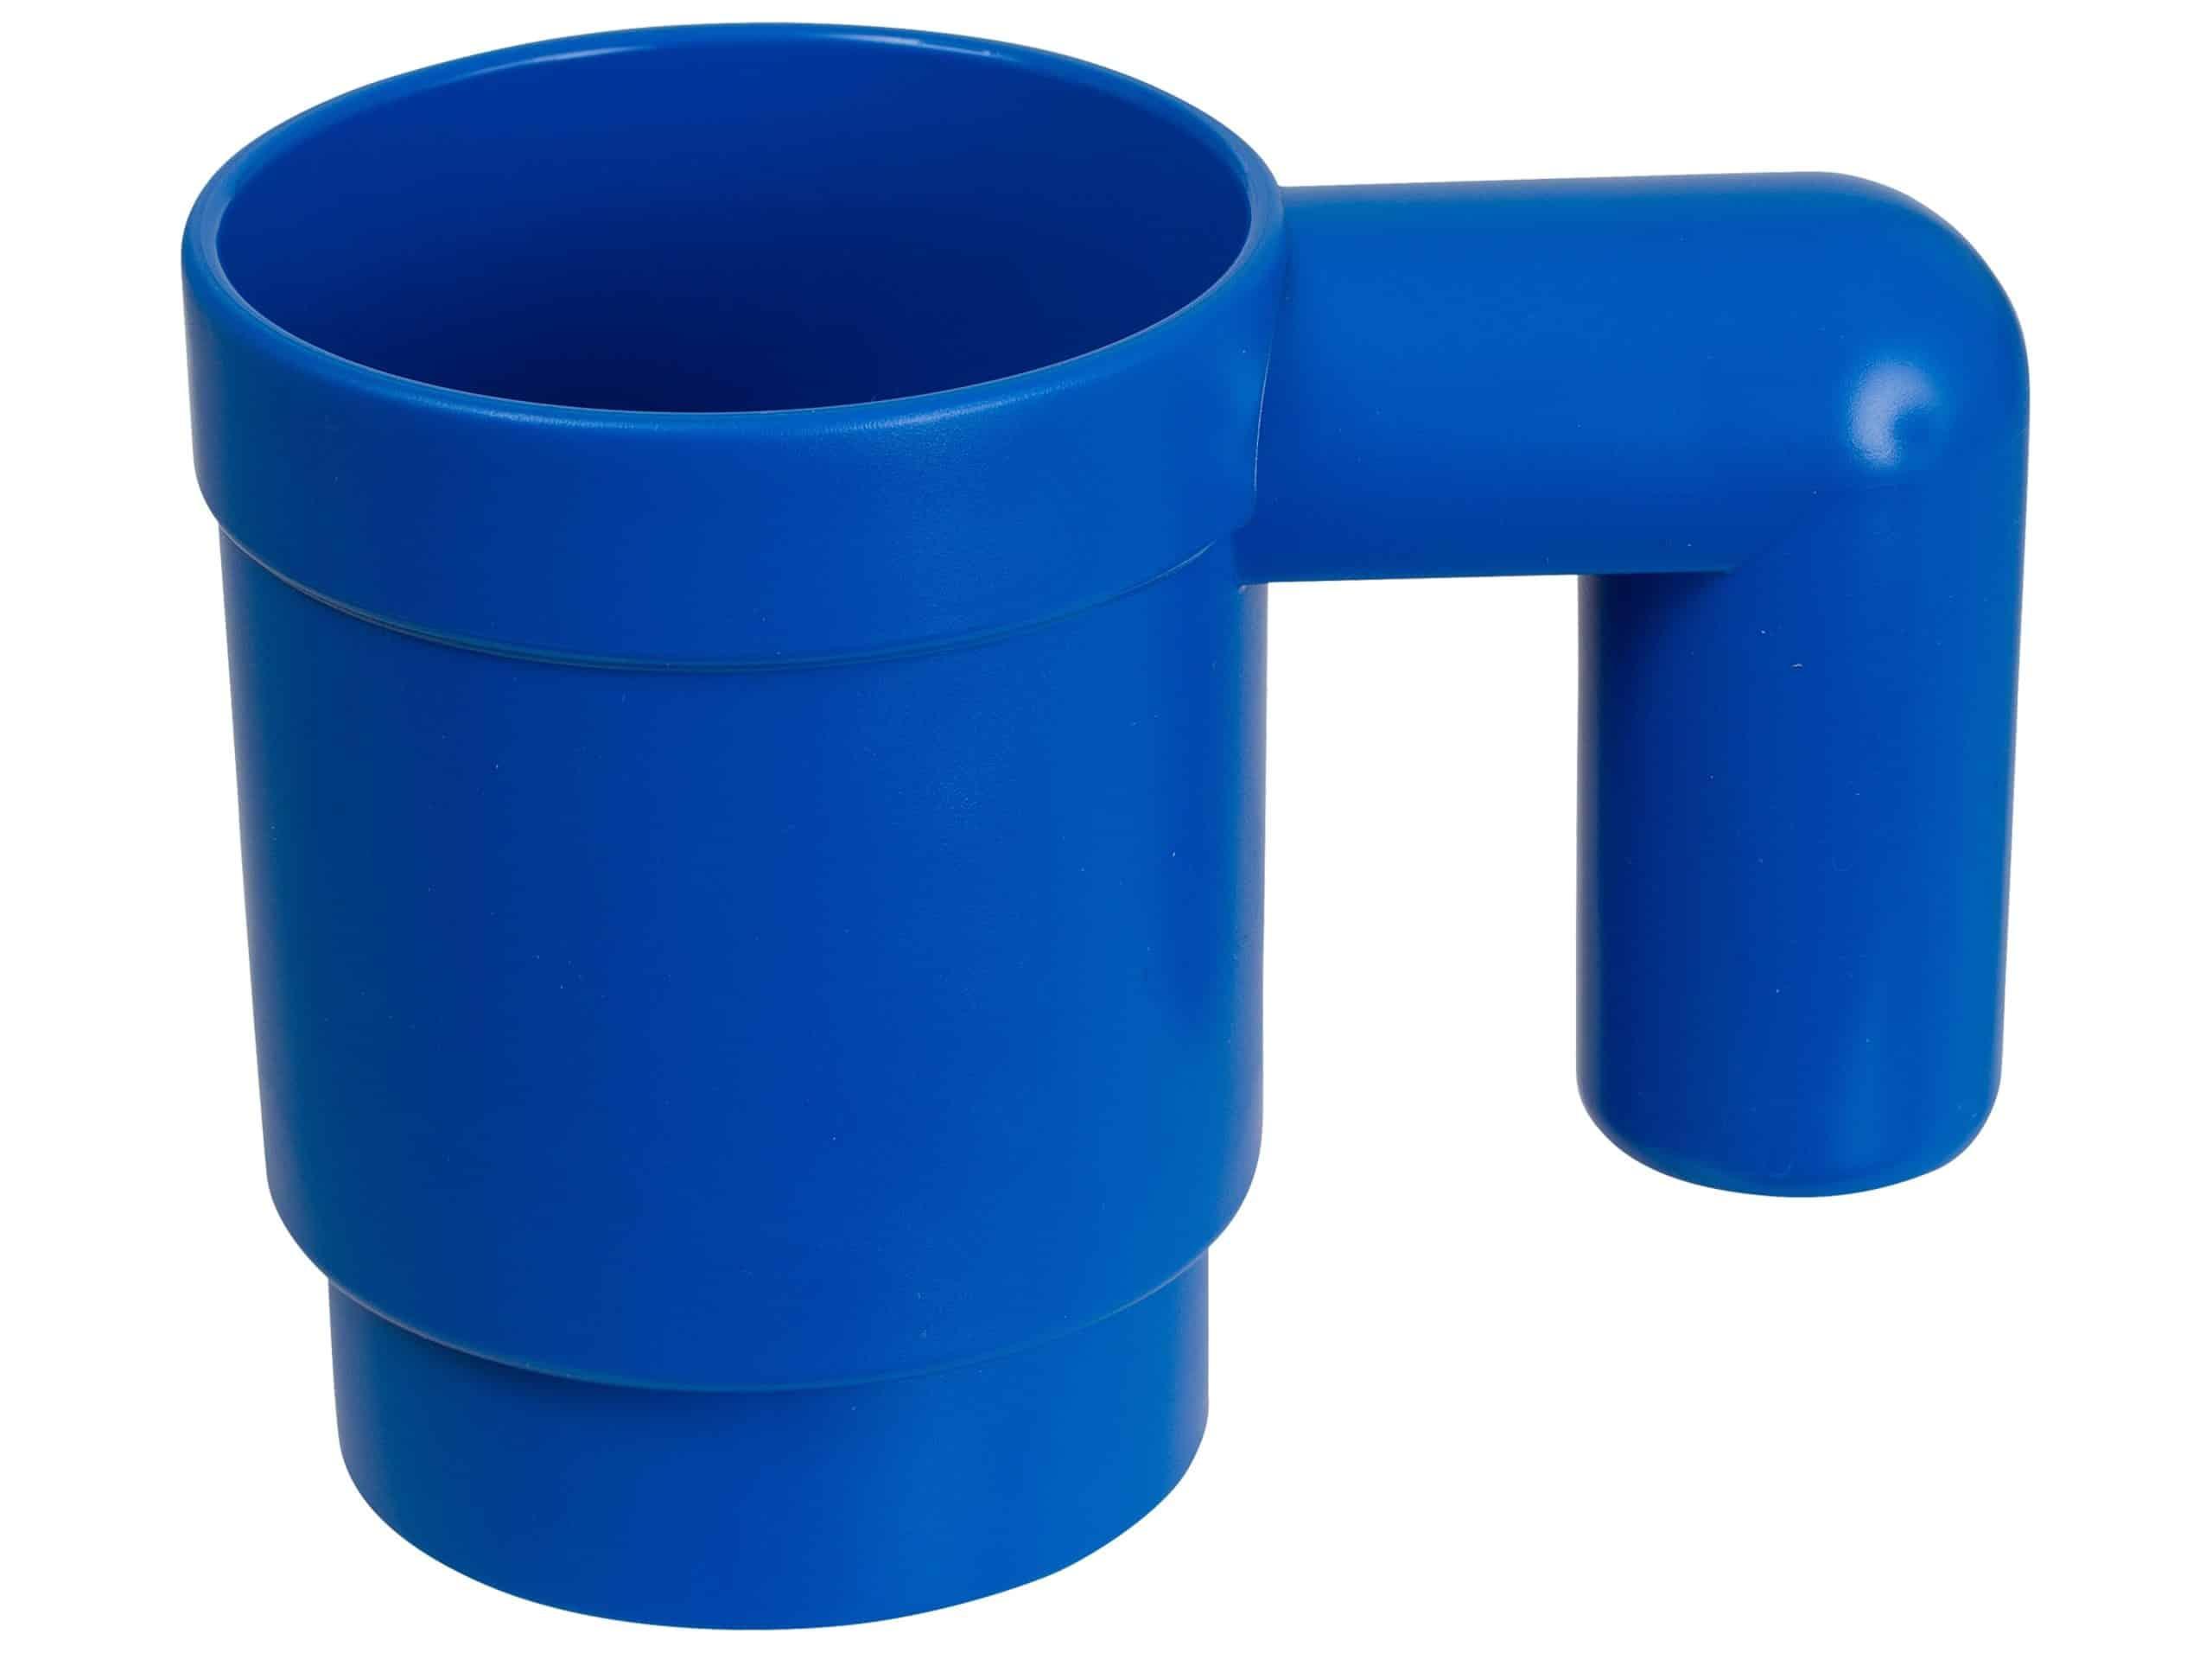 lego reuzendrinkbeker blauw 853465 scaled